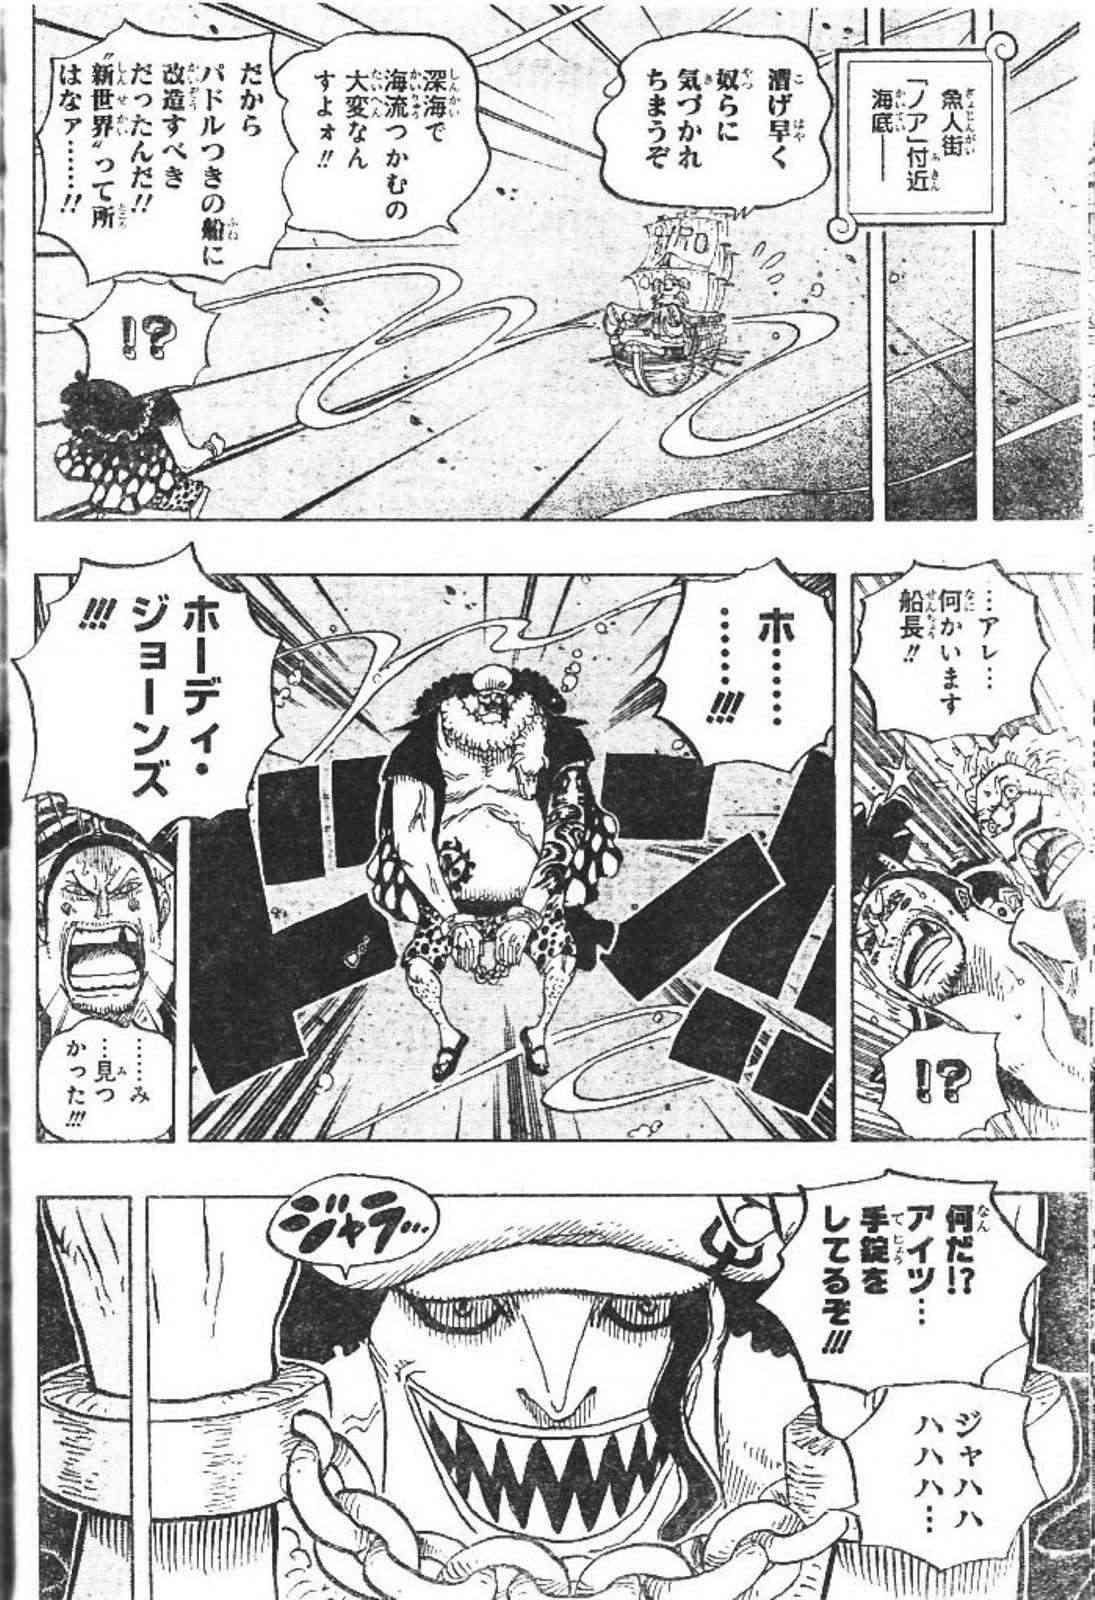 One Piece Manga 611 Spoiler Pics 12_raw10